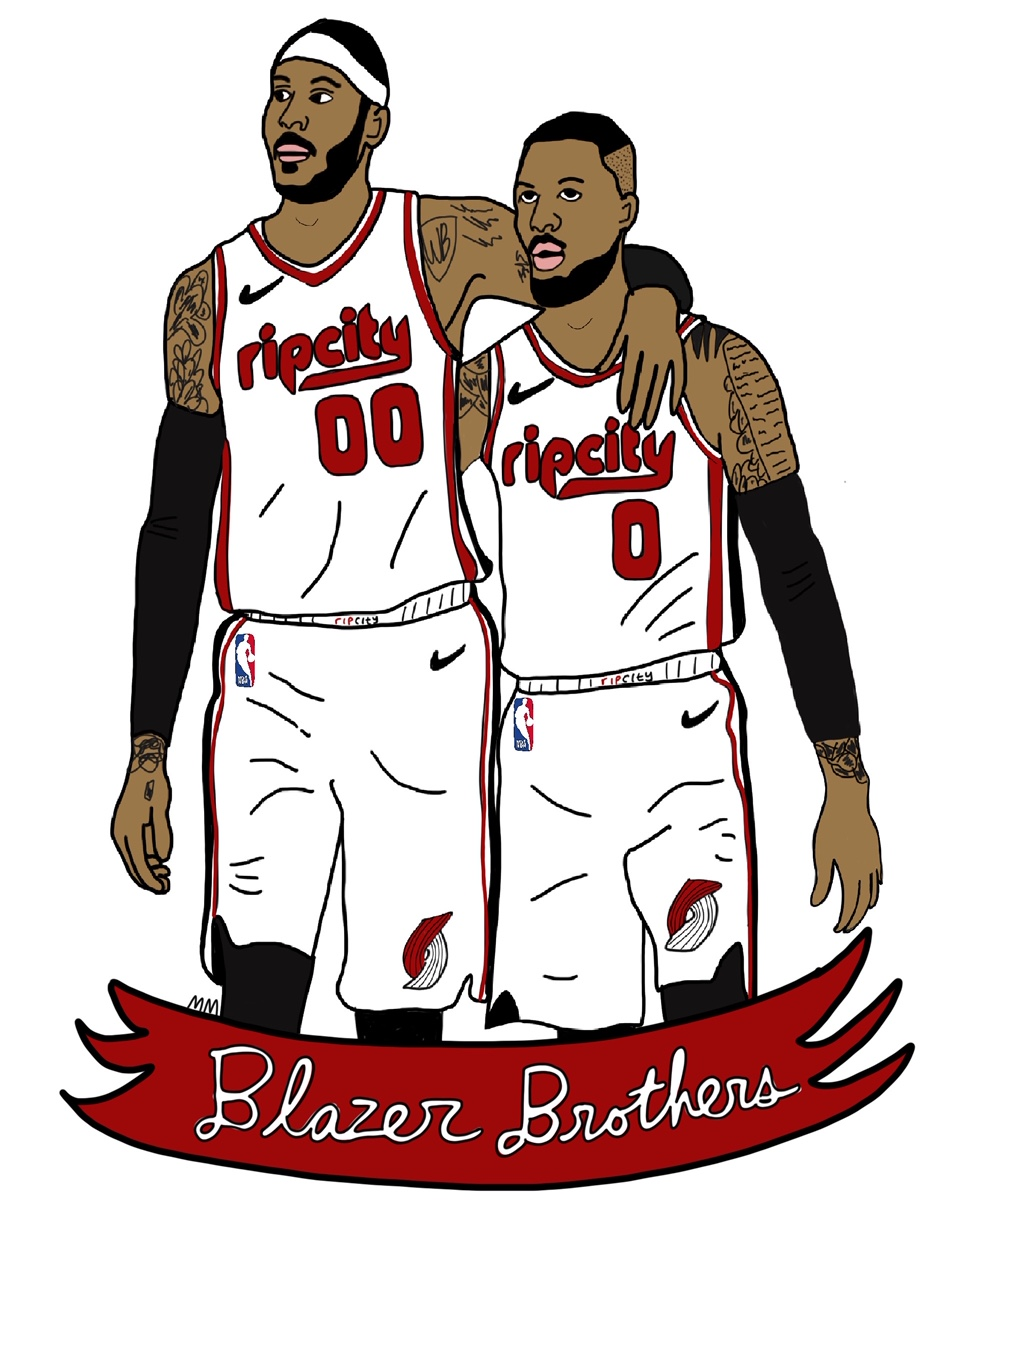 Blazer Brothers